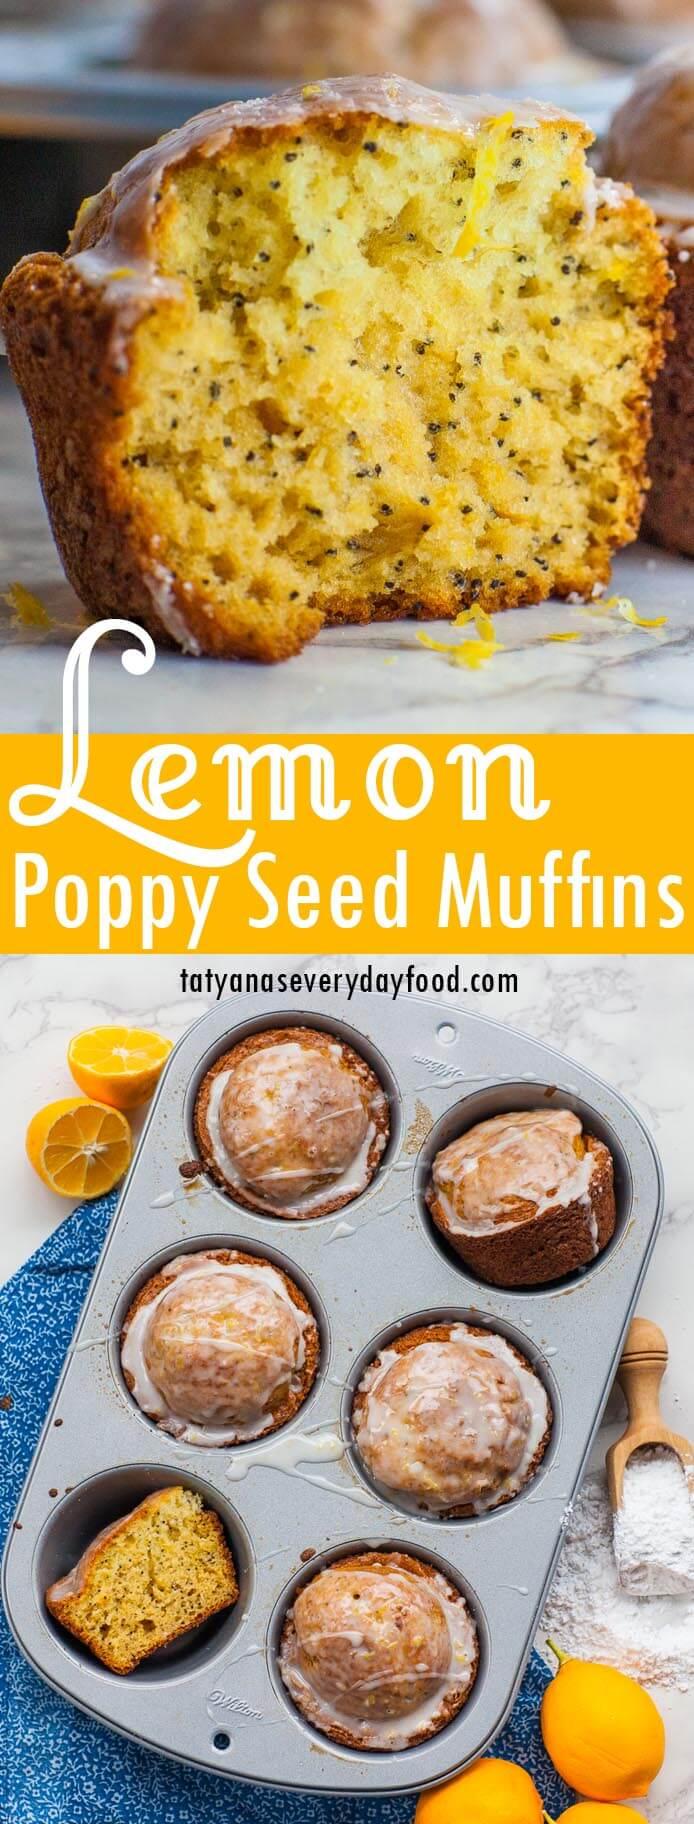 Lemon Poppy Seed Muffins video recipe